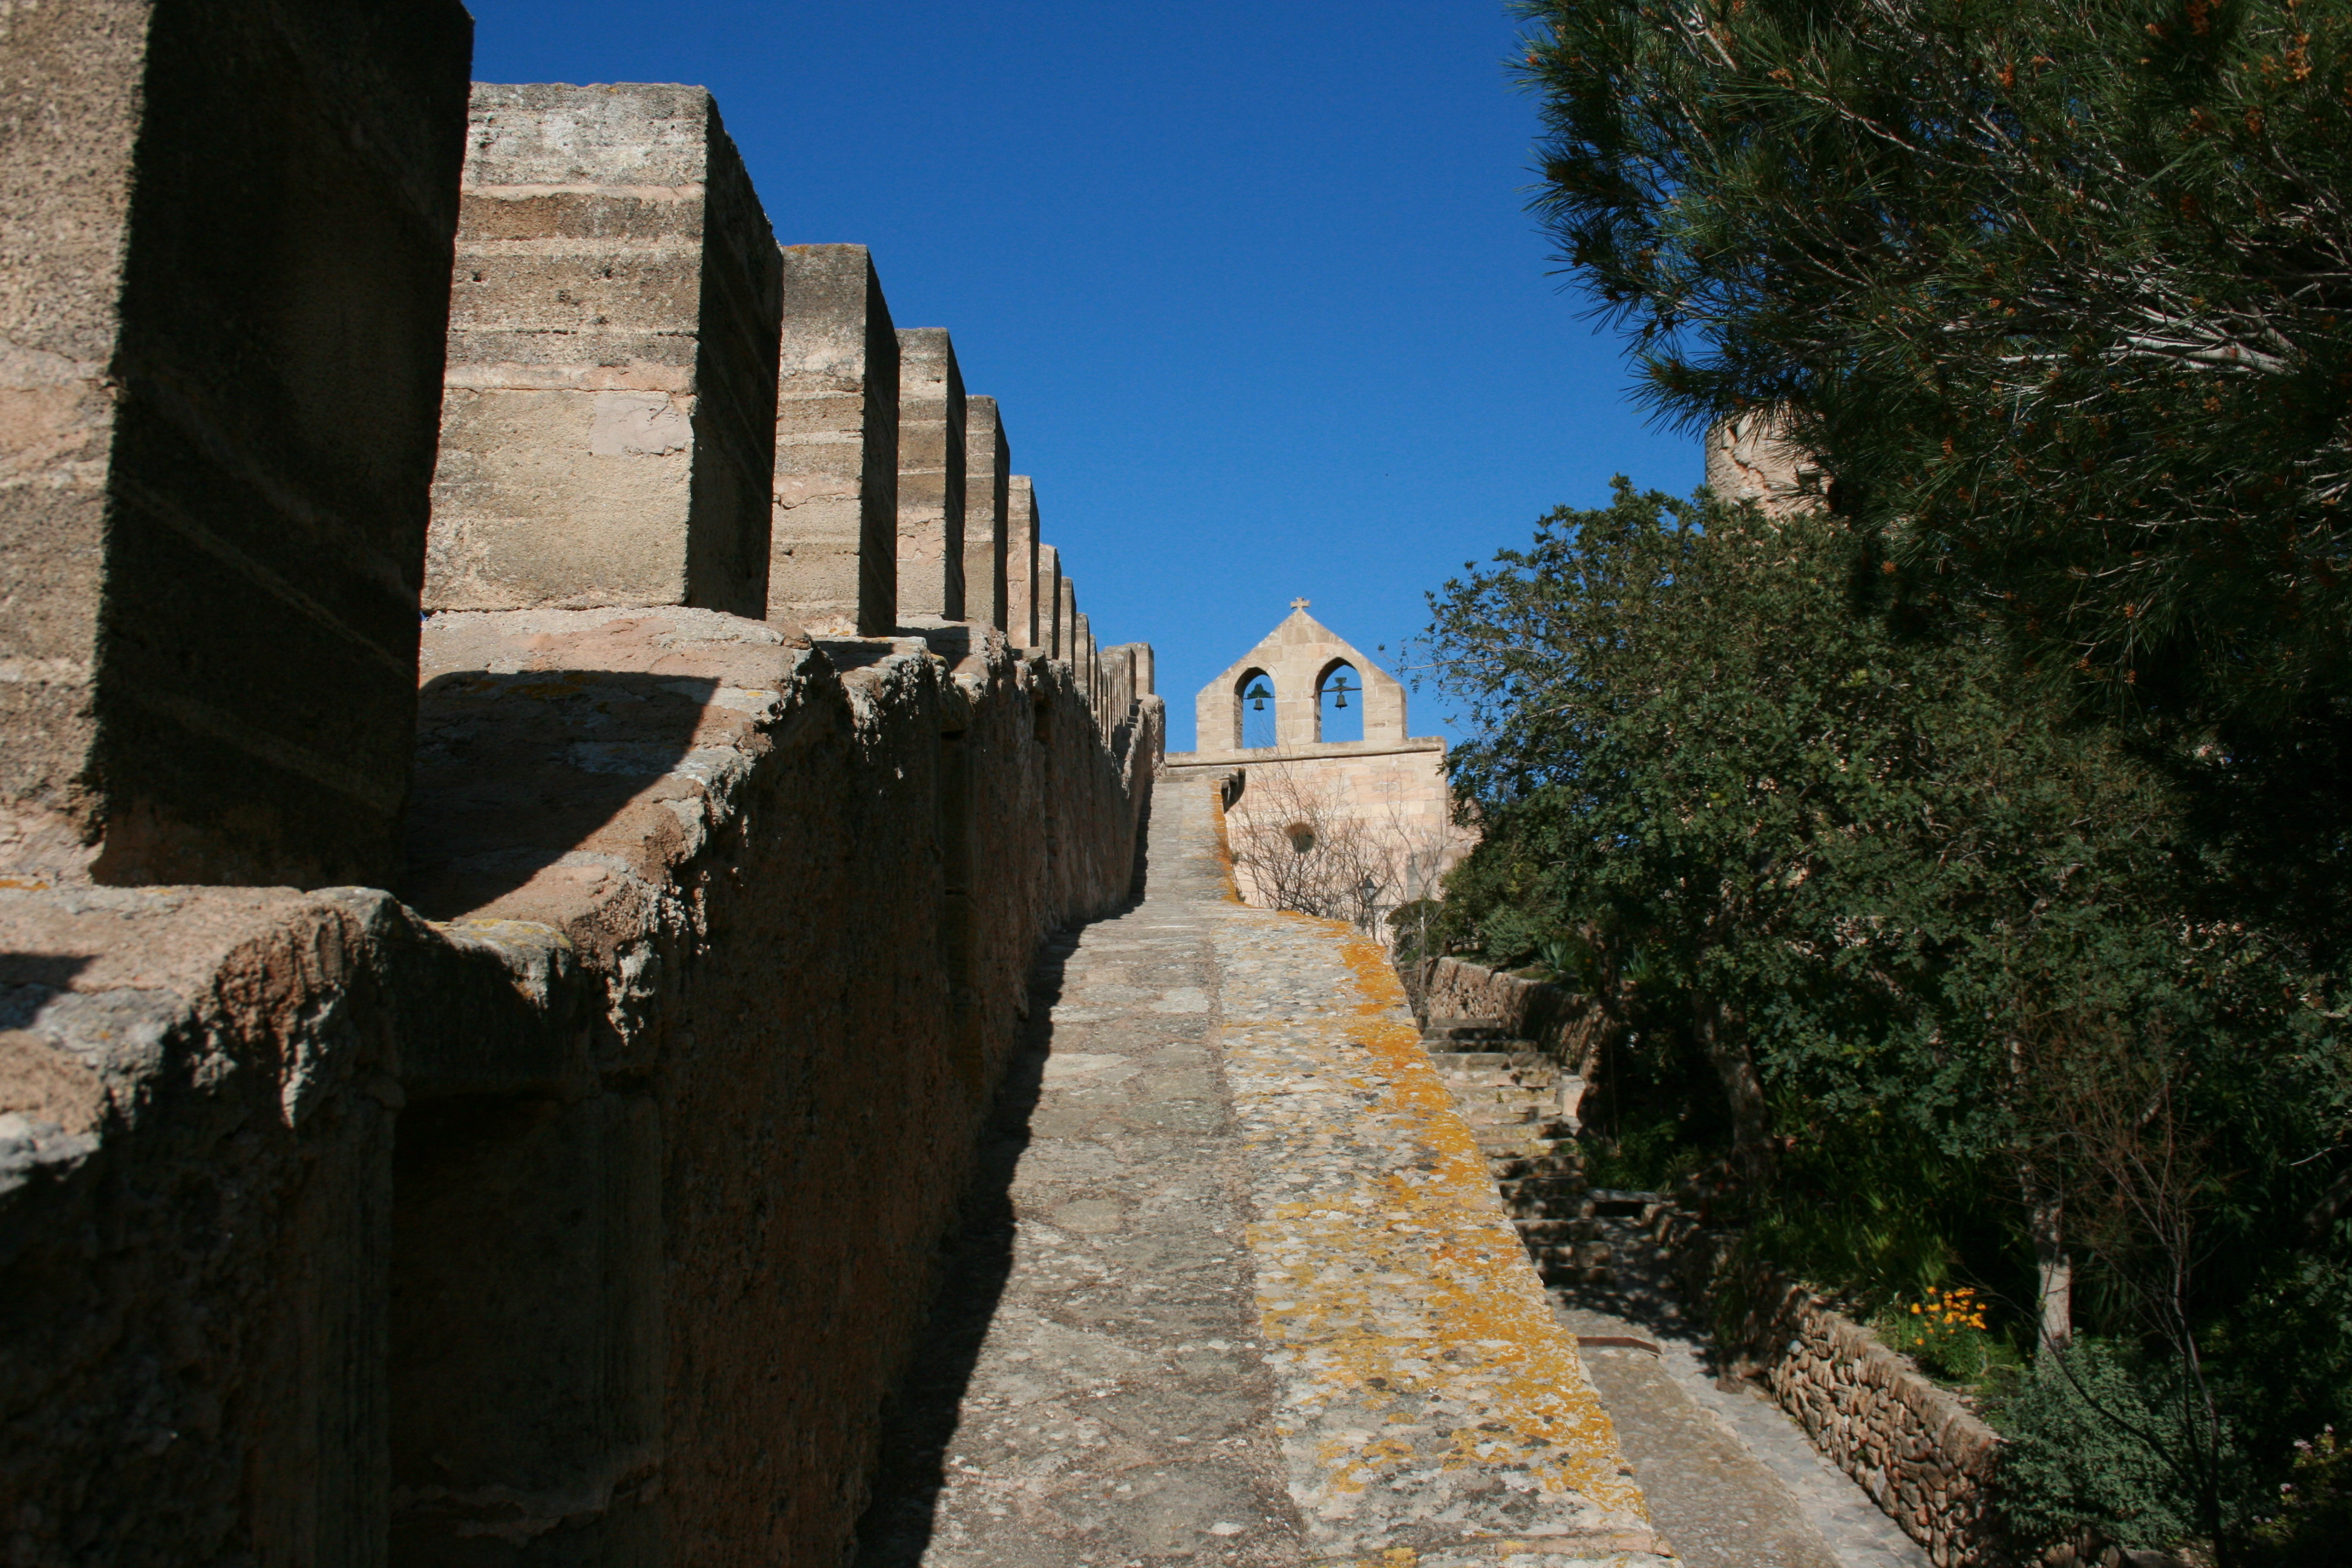 File:Capdepera - Castell de Capdepera - Nuestra Senyora 07 ies.jpg - Wikimedi...